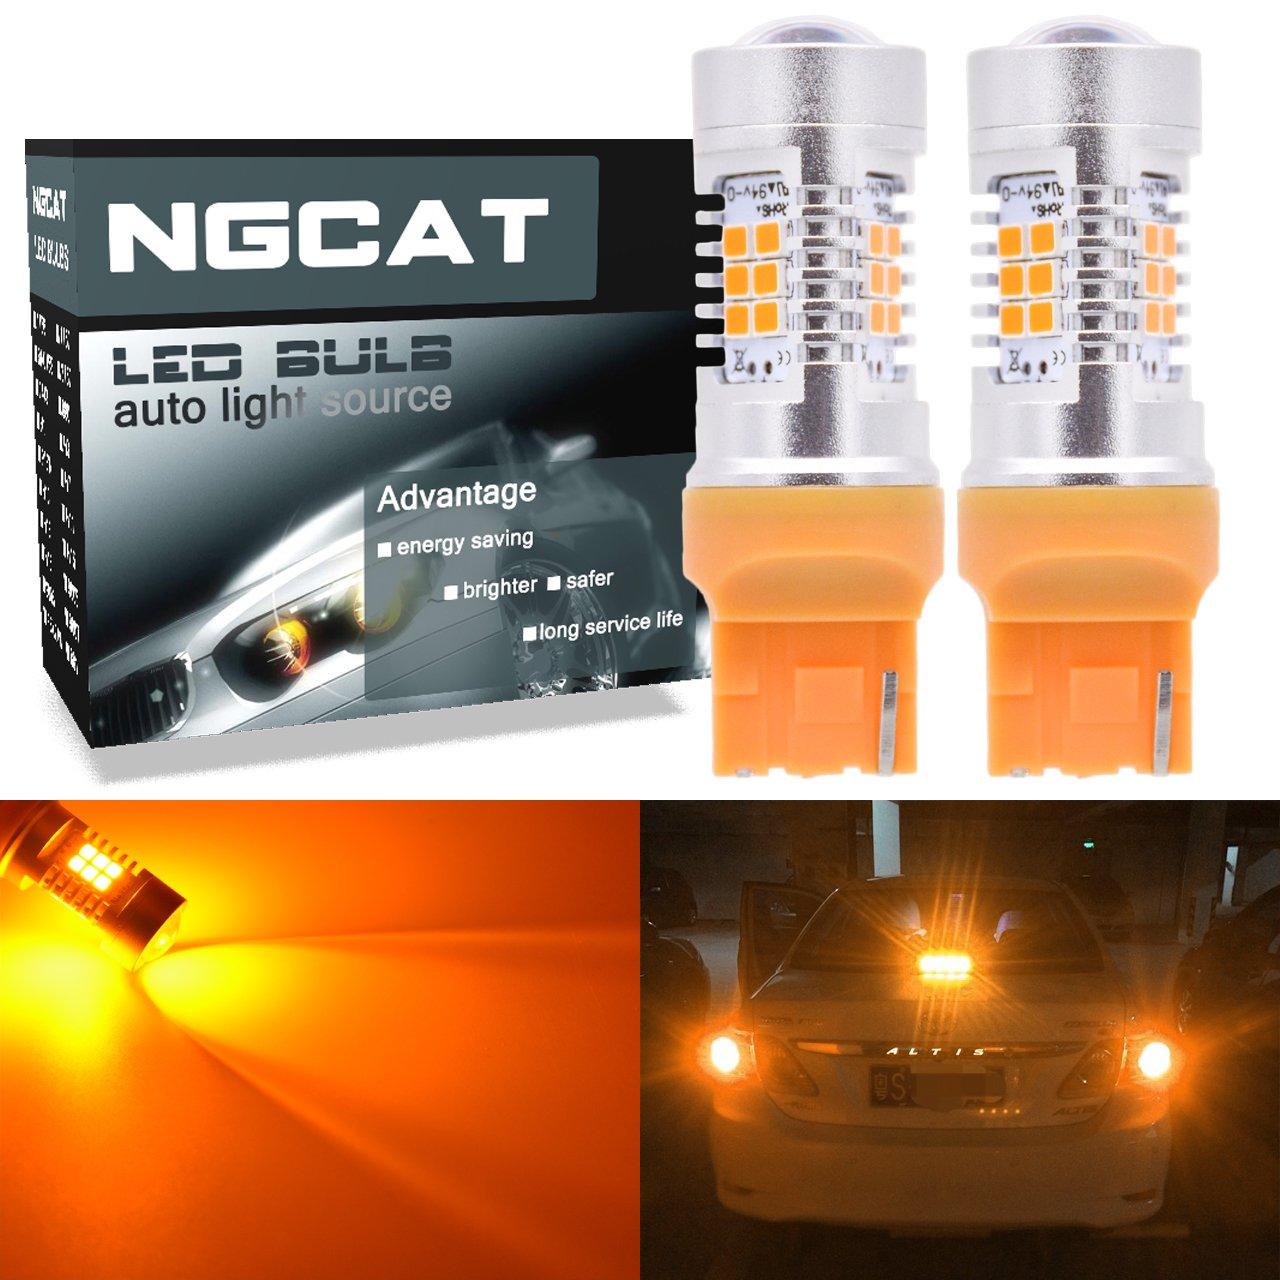 NGCAT 7440 7440NA Led Bulb Auto LED Bulb 2PCS 7441 992 T20 2835 21 SMD Chipsets LED Bulbs with Lens Projector Brake Turn Signal Tail Backup Reverse Lights, Amber 10-16V 10.5W